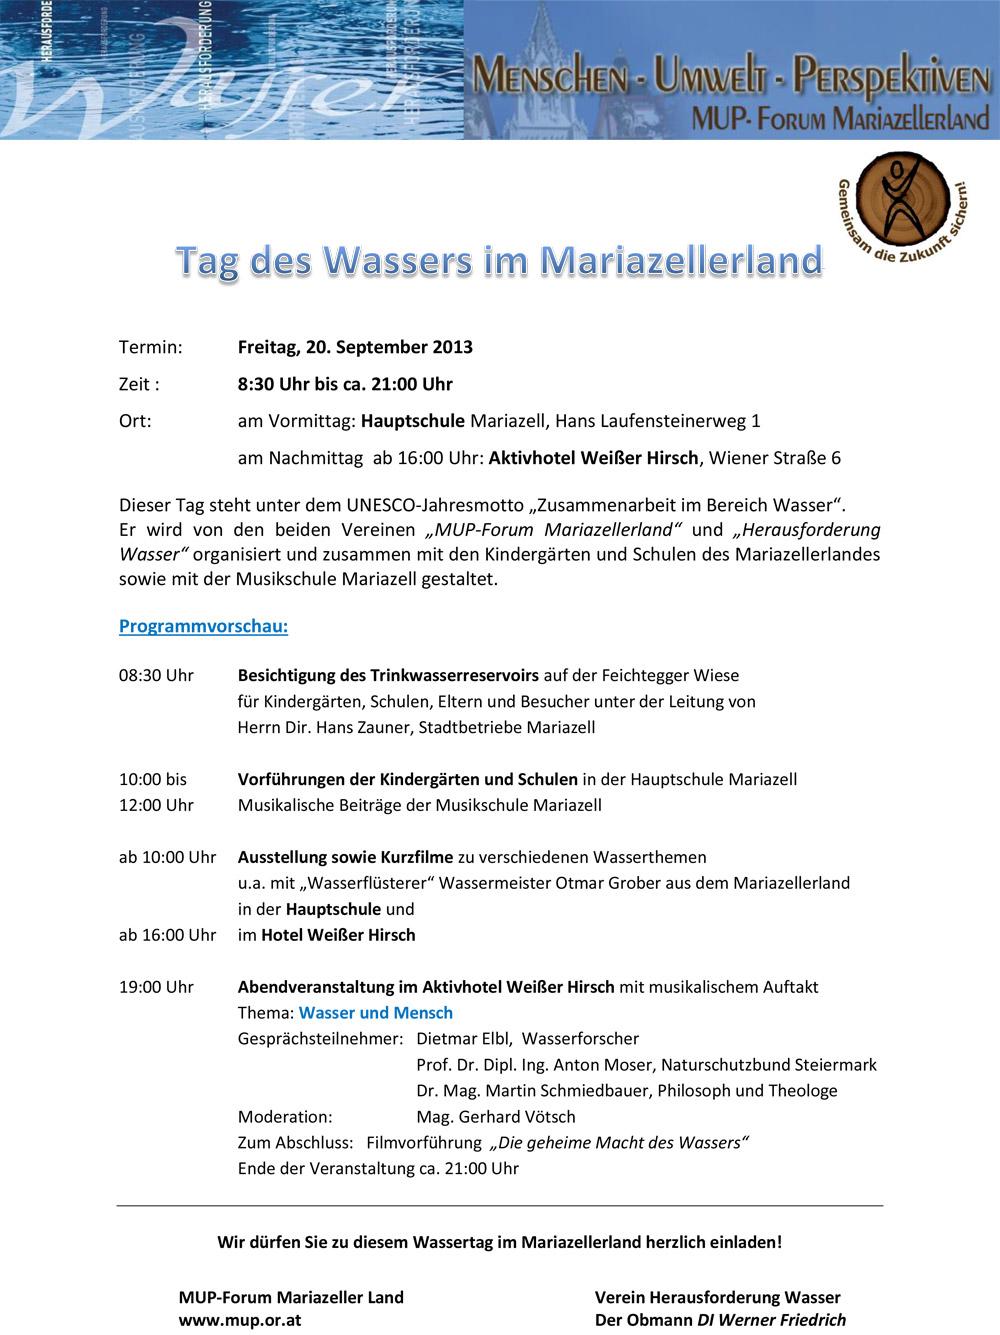 Flugblatt_Tag-des-Wassers_Mariazellerland_Sept_2013-1